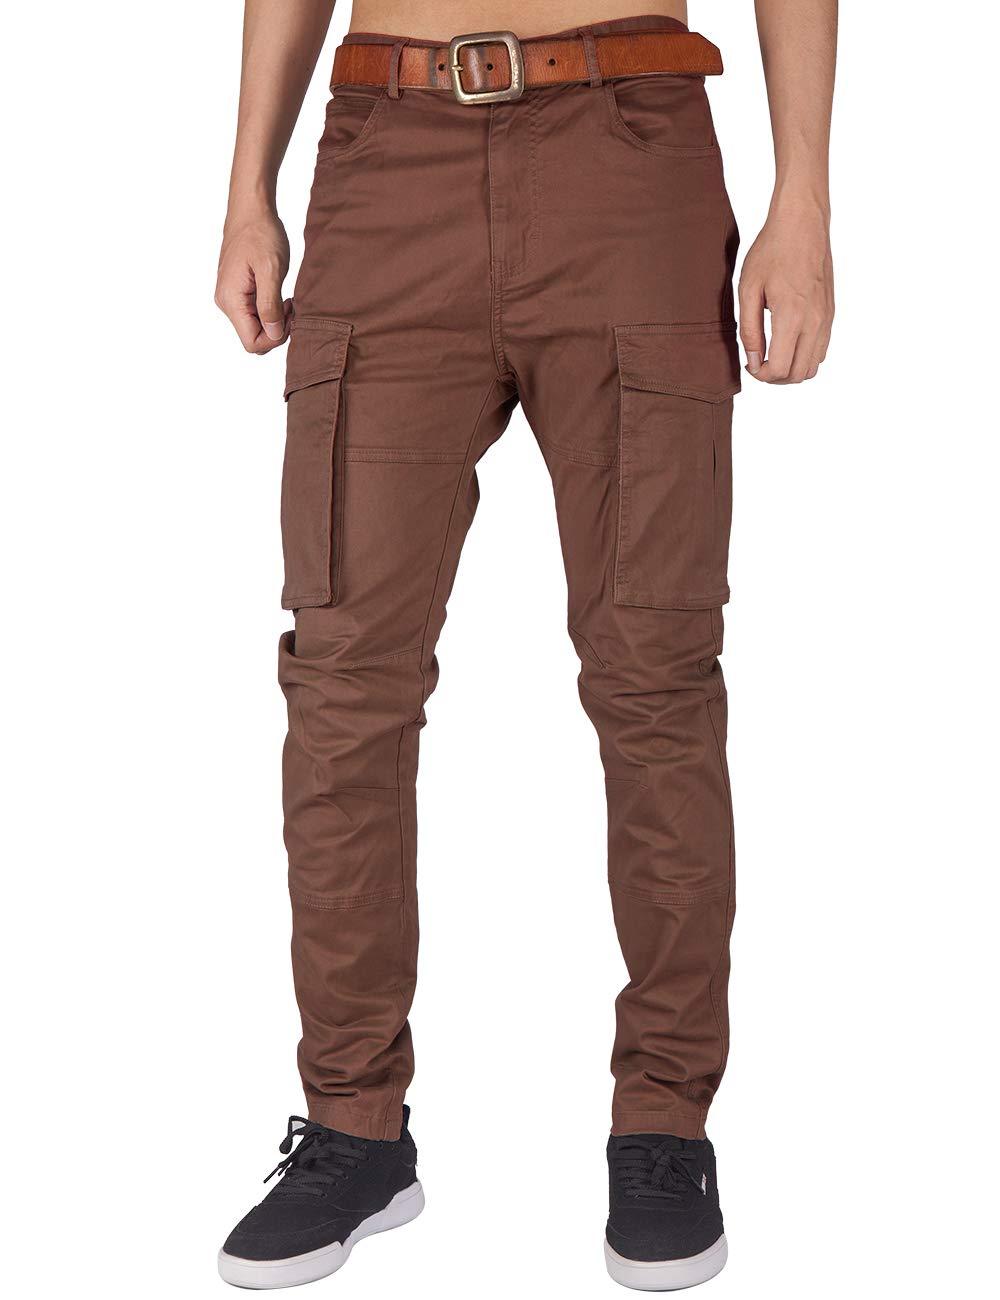 ITALY MORN Men's Chino Cargo Skinny Casual Pants S Dark Brown